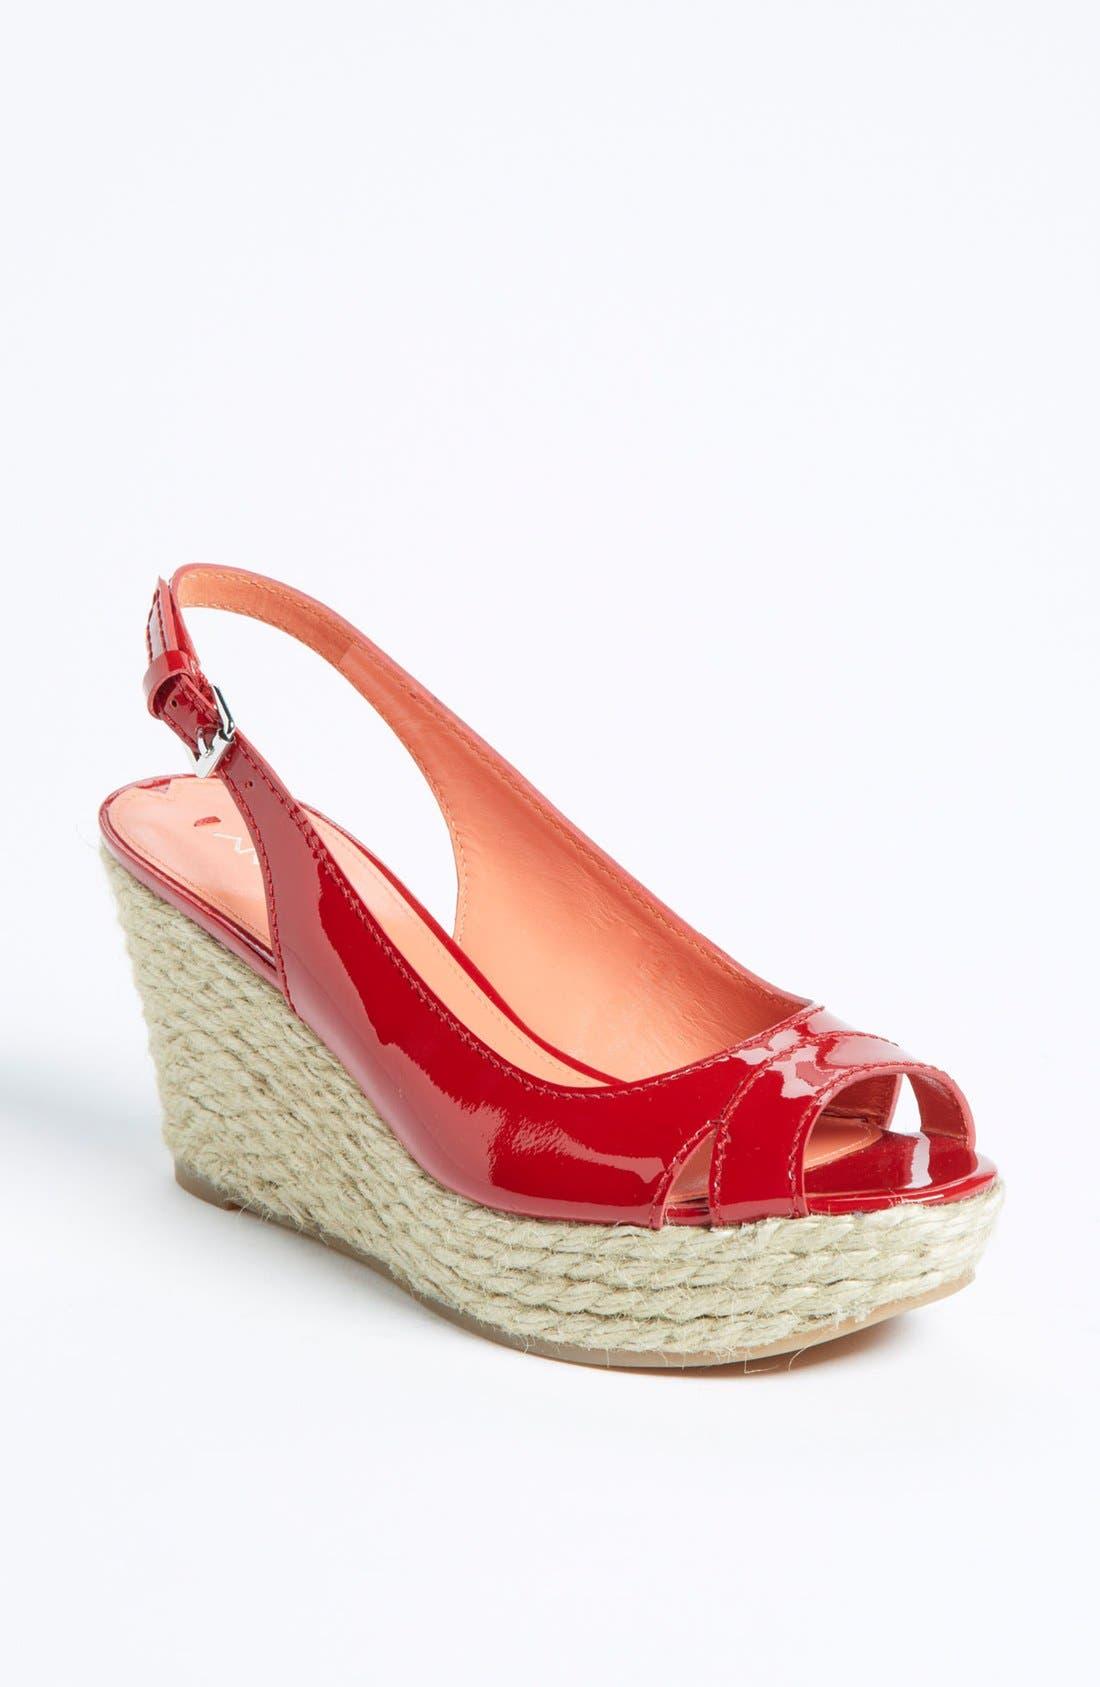 Alternate Image 1 Selected - Via Spiga 'Mahala' Wedge Sandal